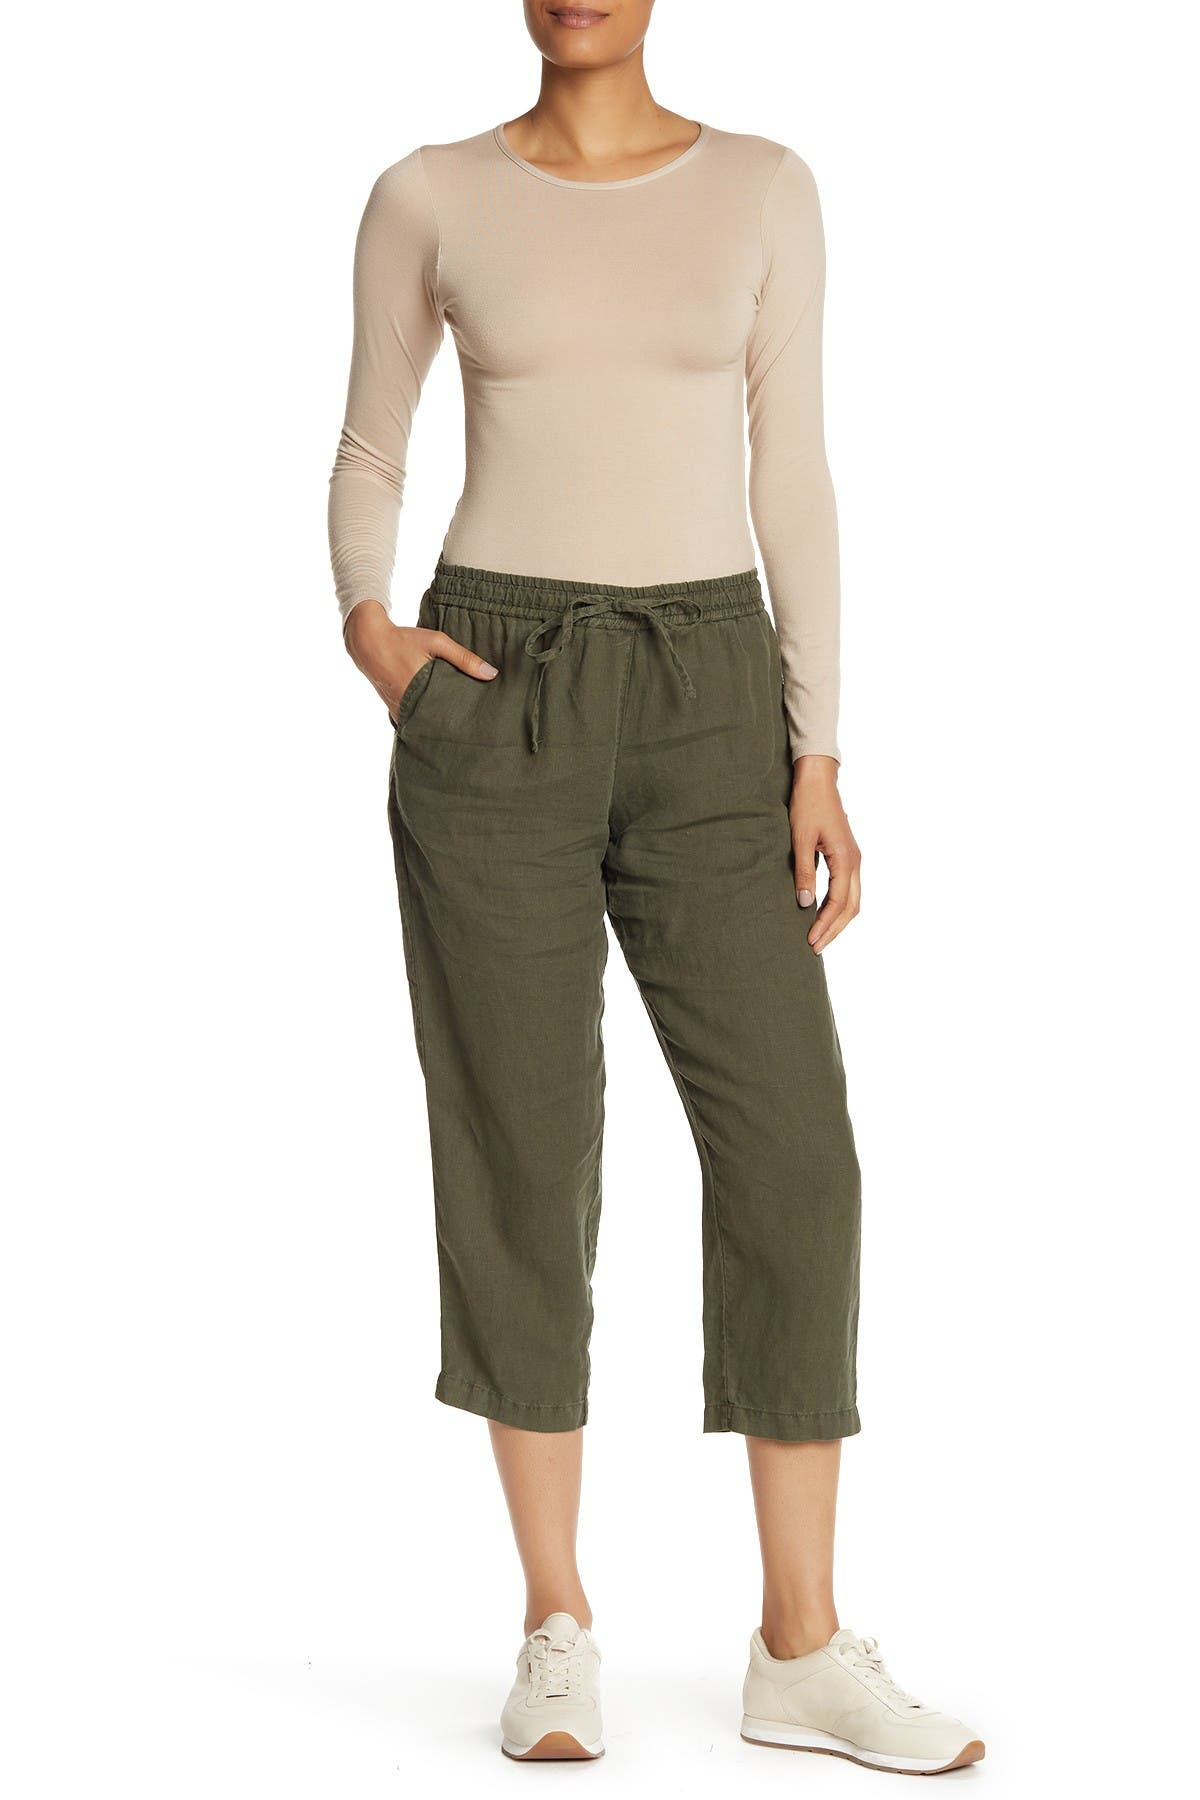 Image of Tommy Bahama Easy Crop Linen Pants